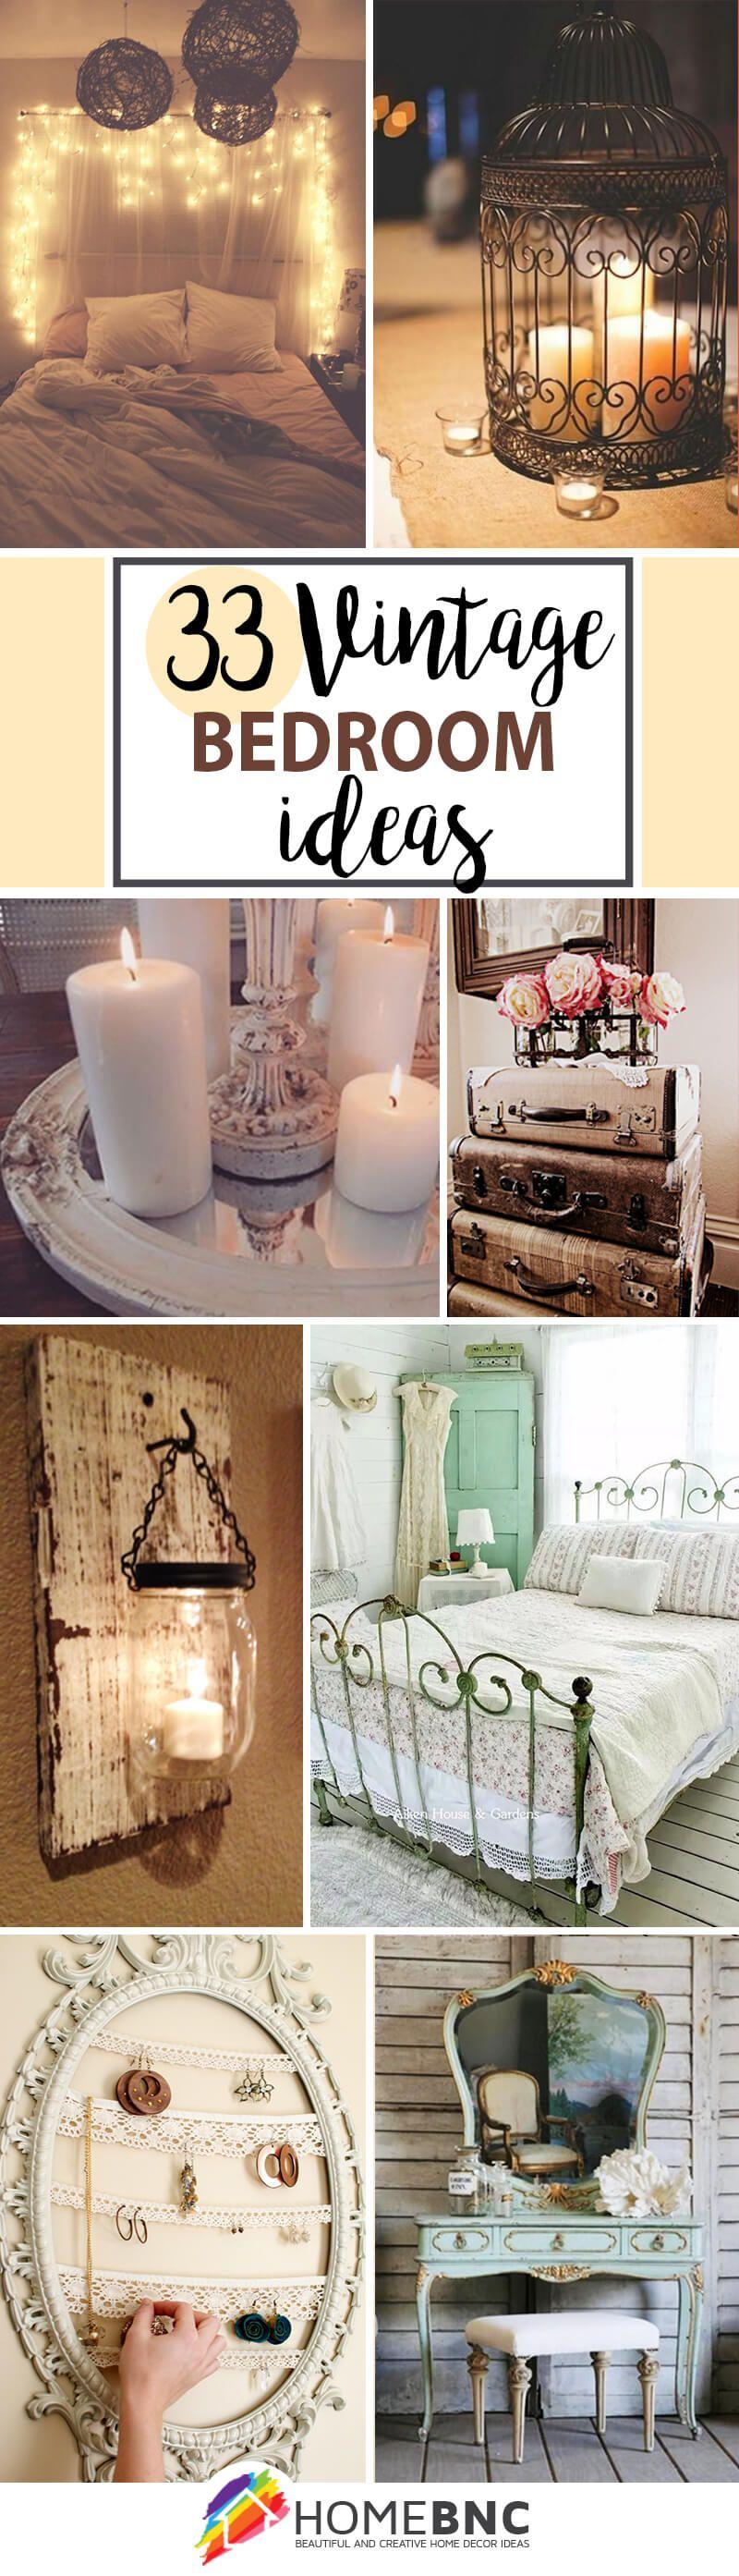 Vintage Bedroom Decorations Vintage Bedroom Decor Vintage Room